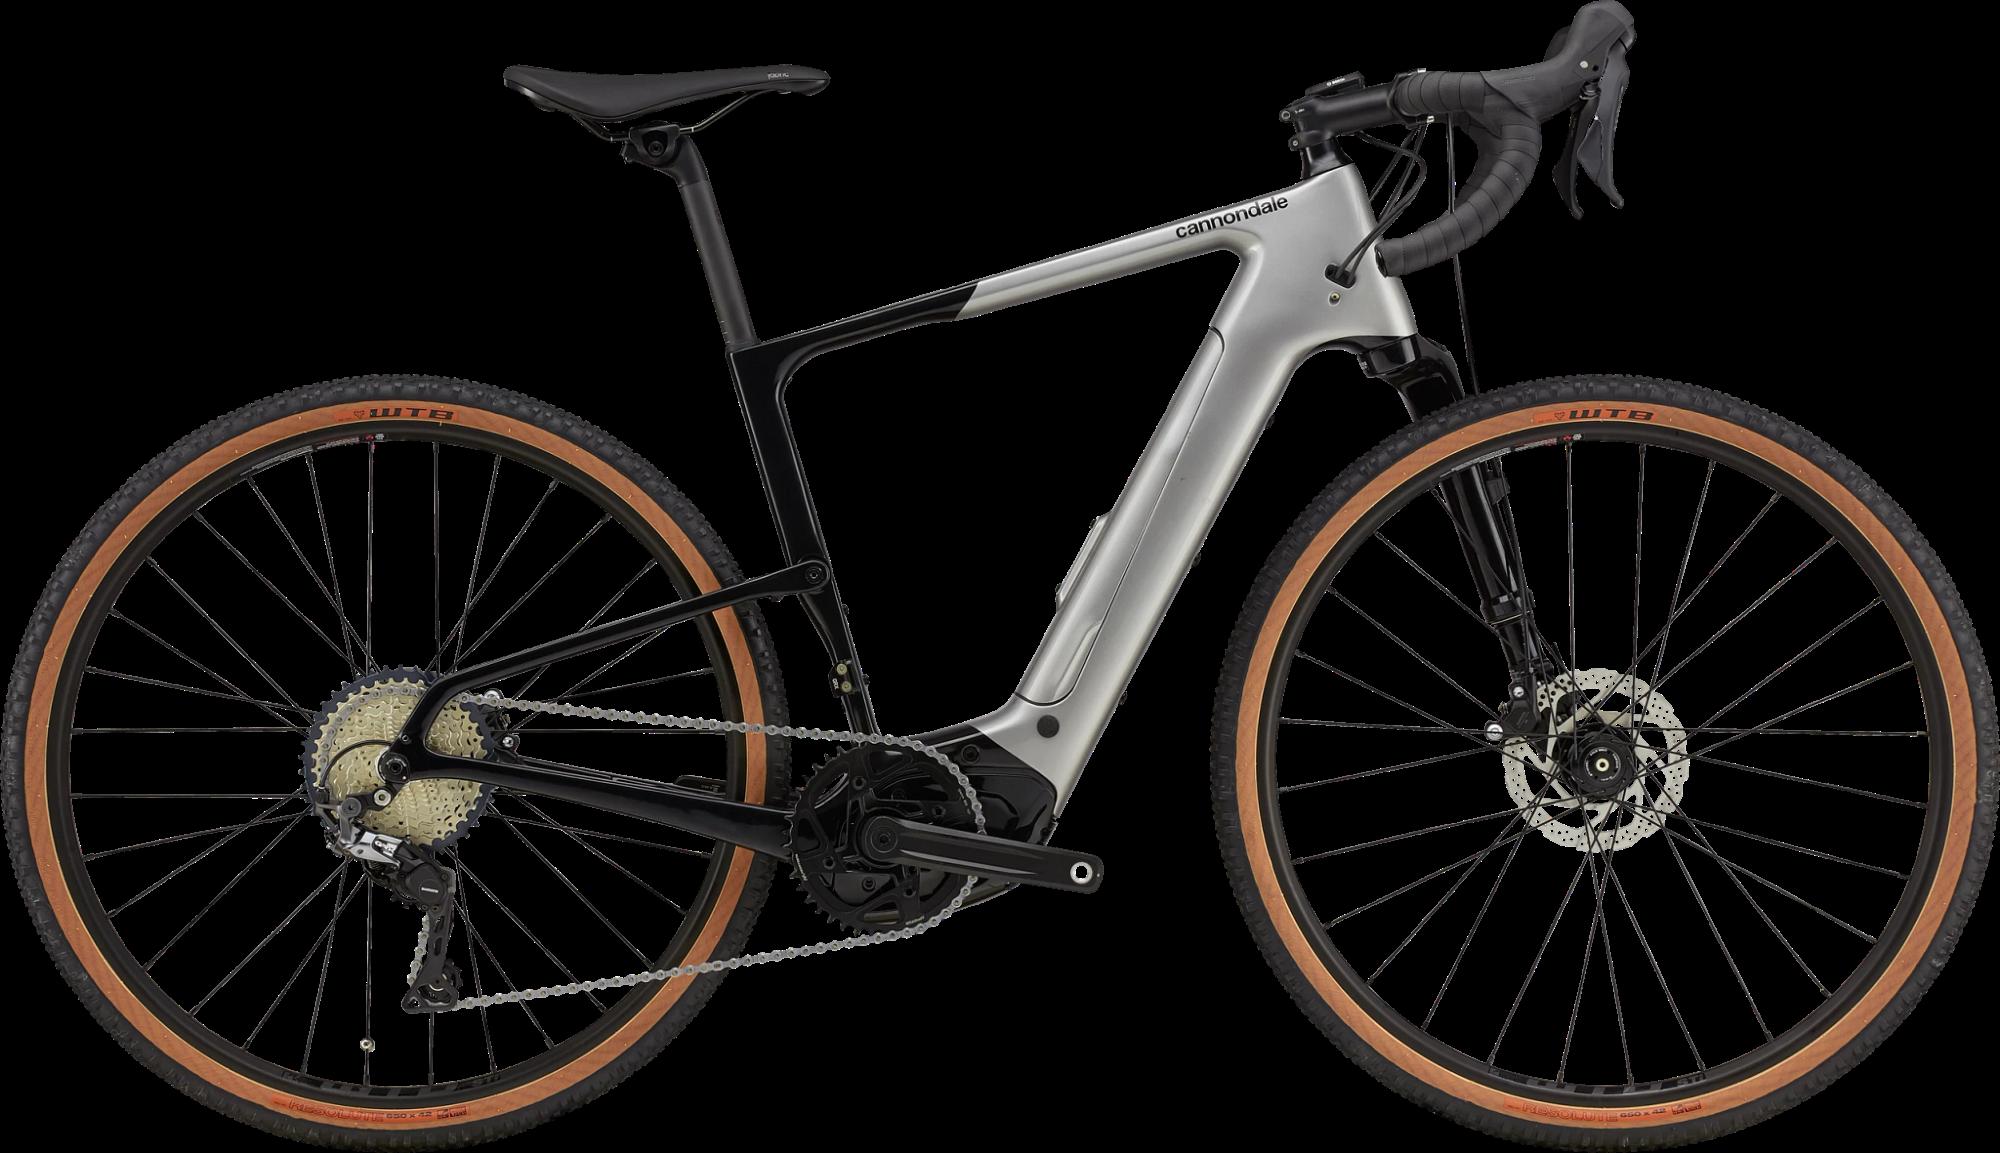 https://www.cannondale.com/ja-jp/bikes/electric/e-road/topstone-neo/topstone-neo-carbon-lefty-3-c62341u?sku=c62341u10lg